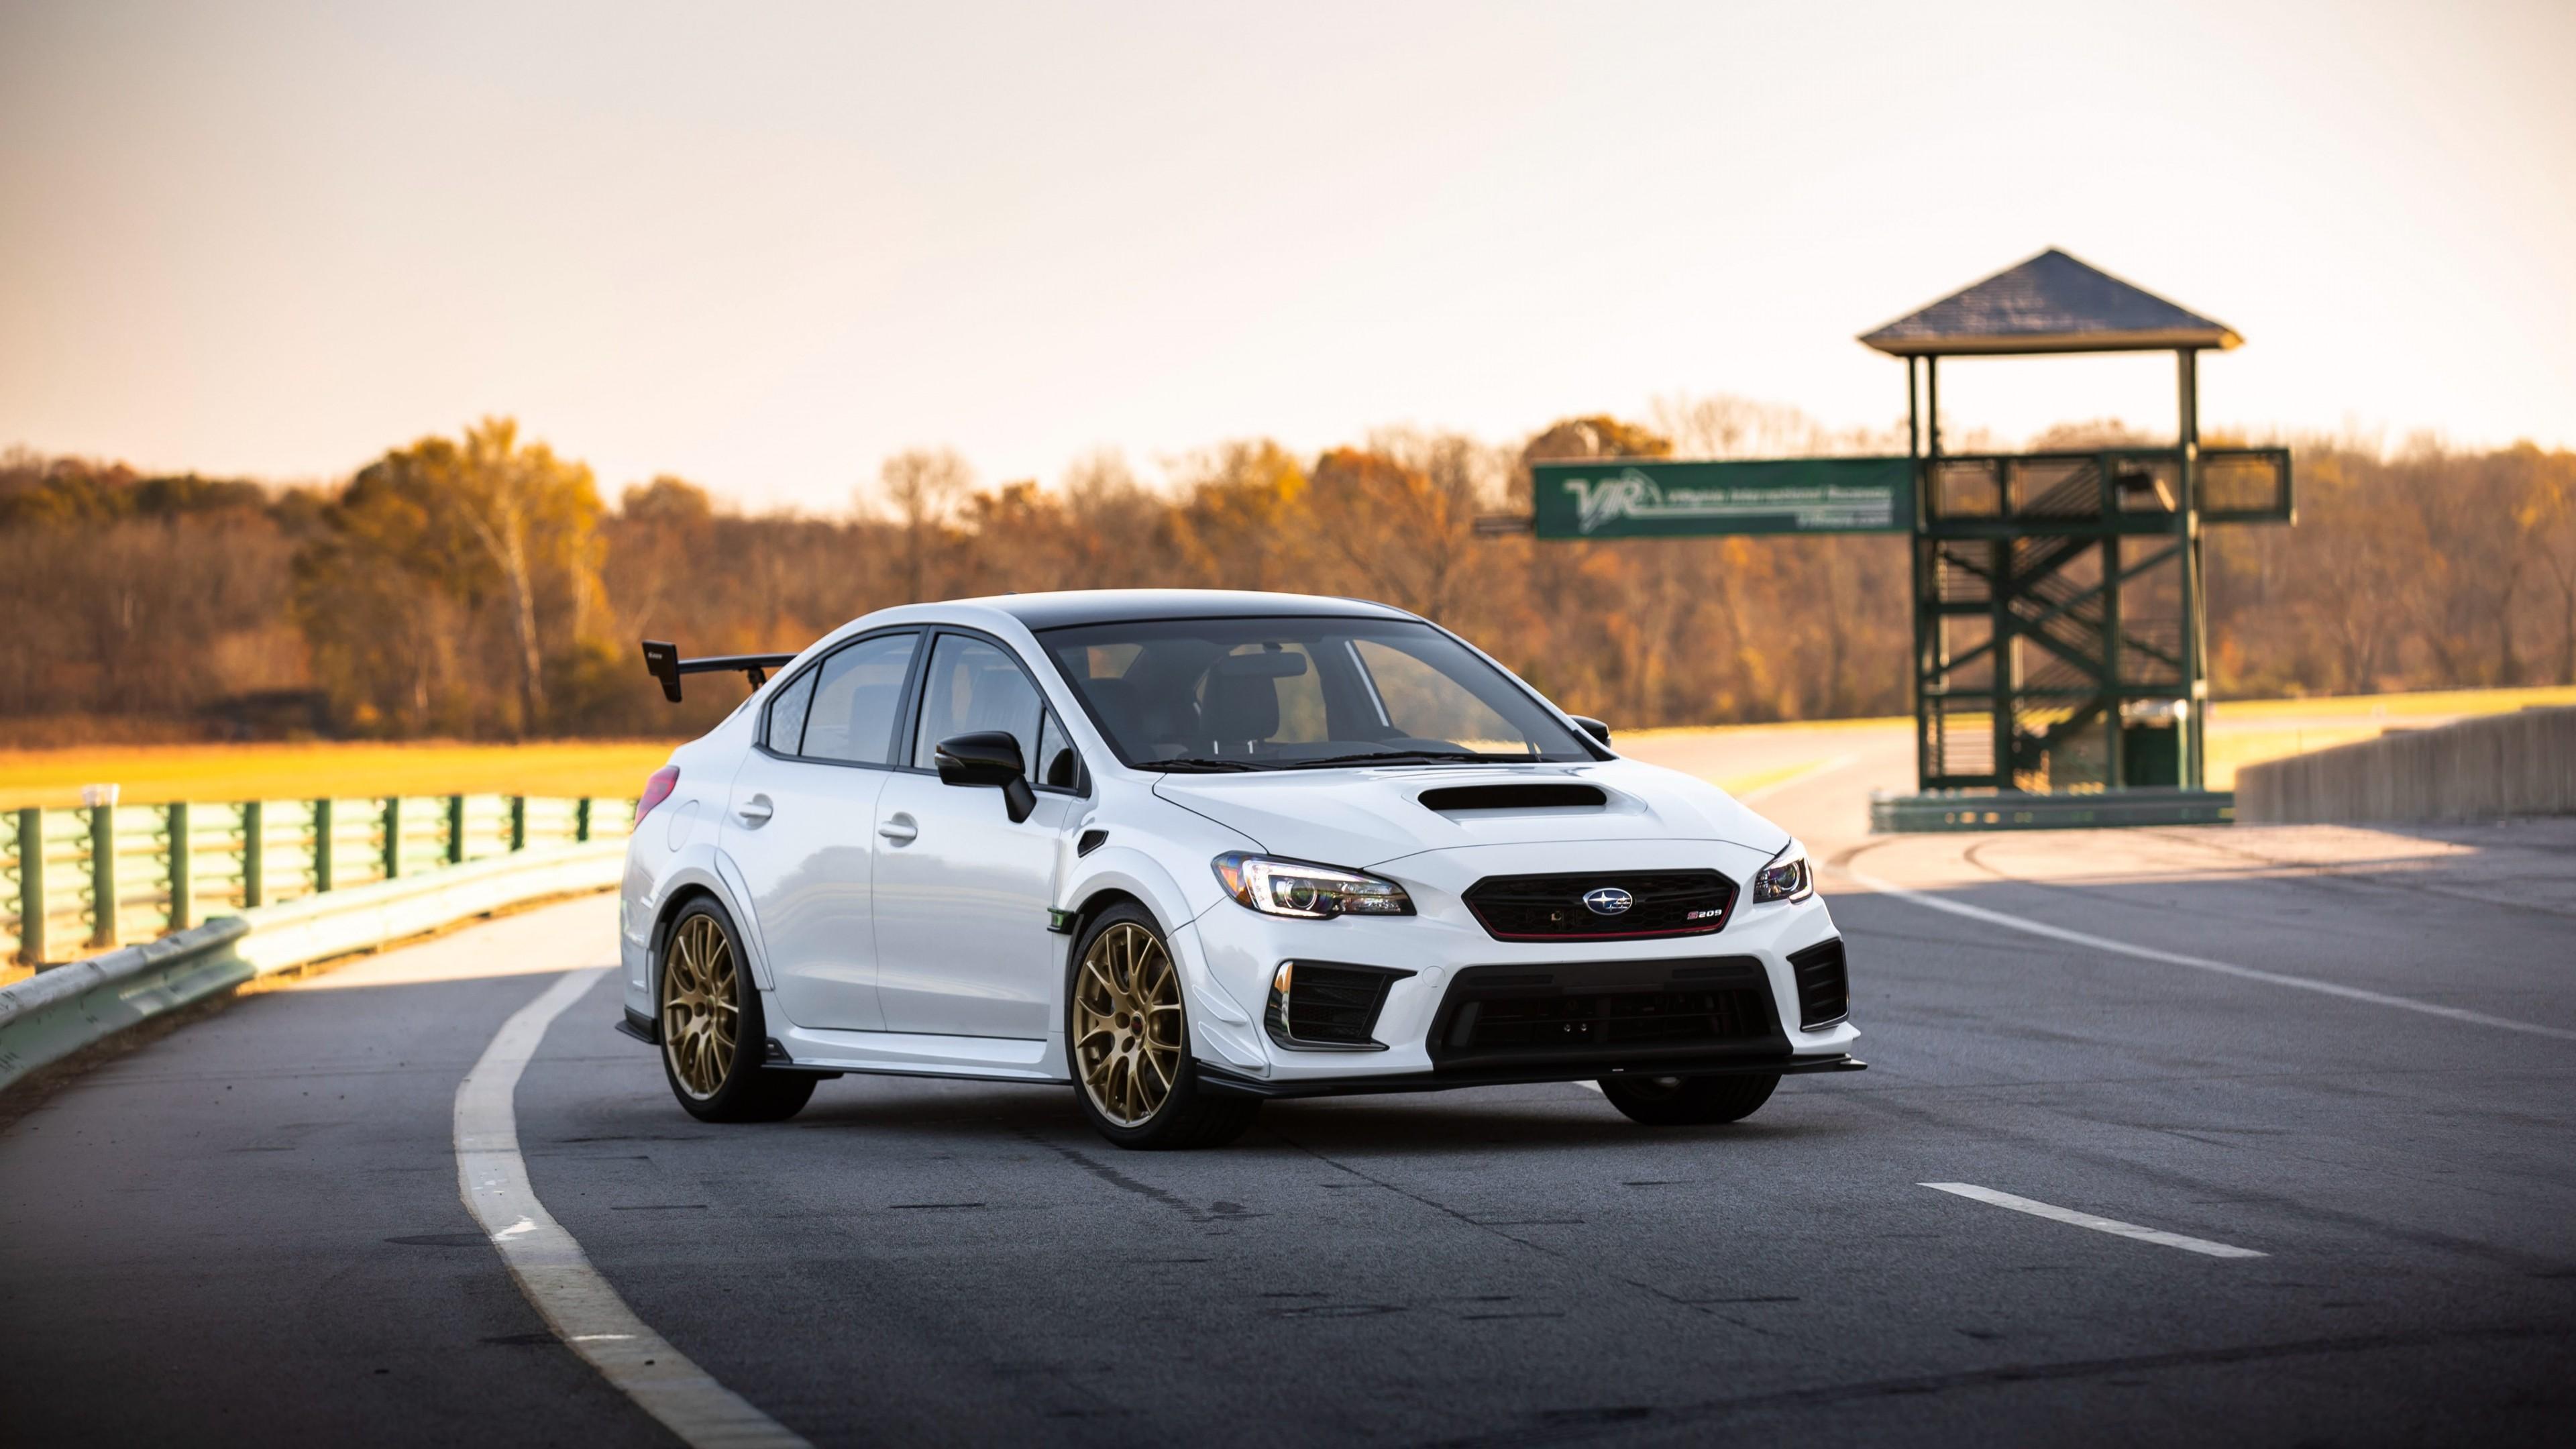 Wallpaper Subaru Sti S209 2019 Cars 2019 Detroit Auto Show